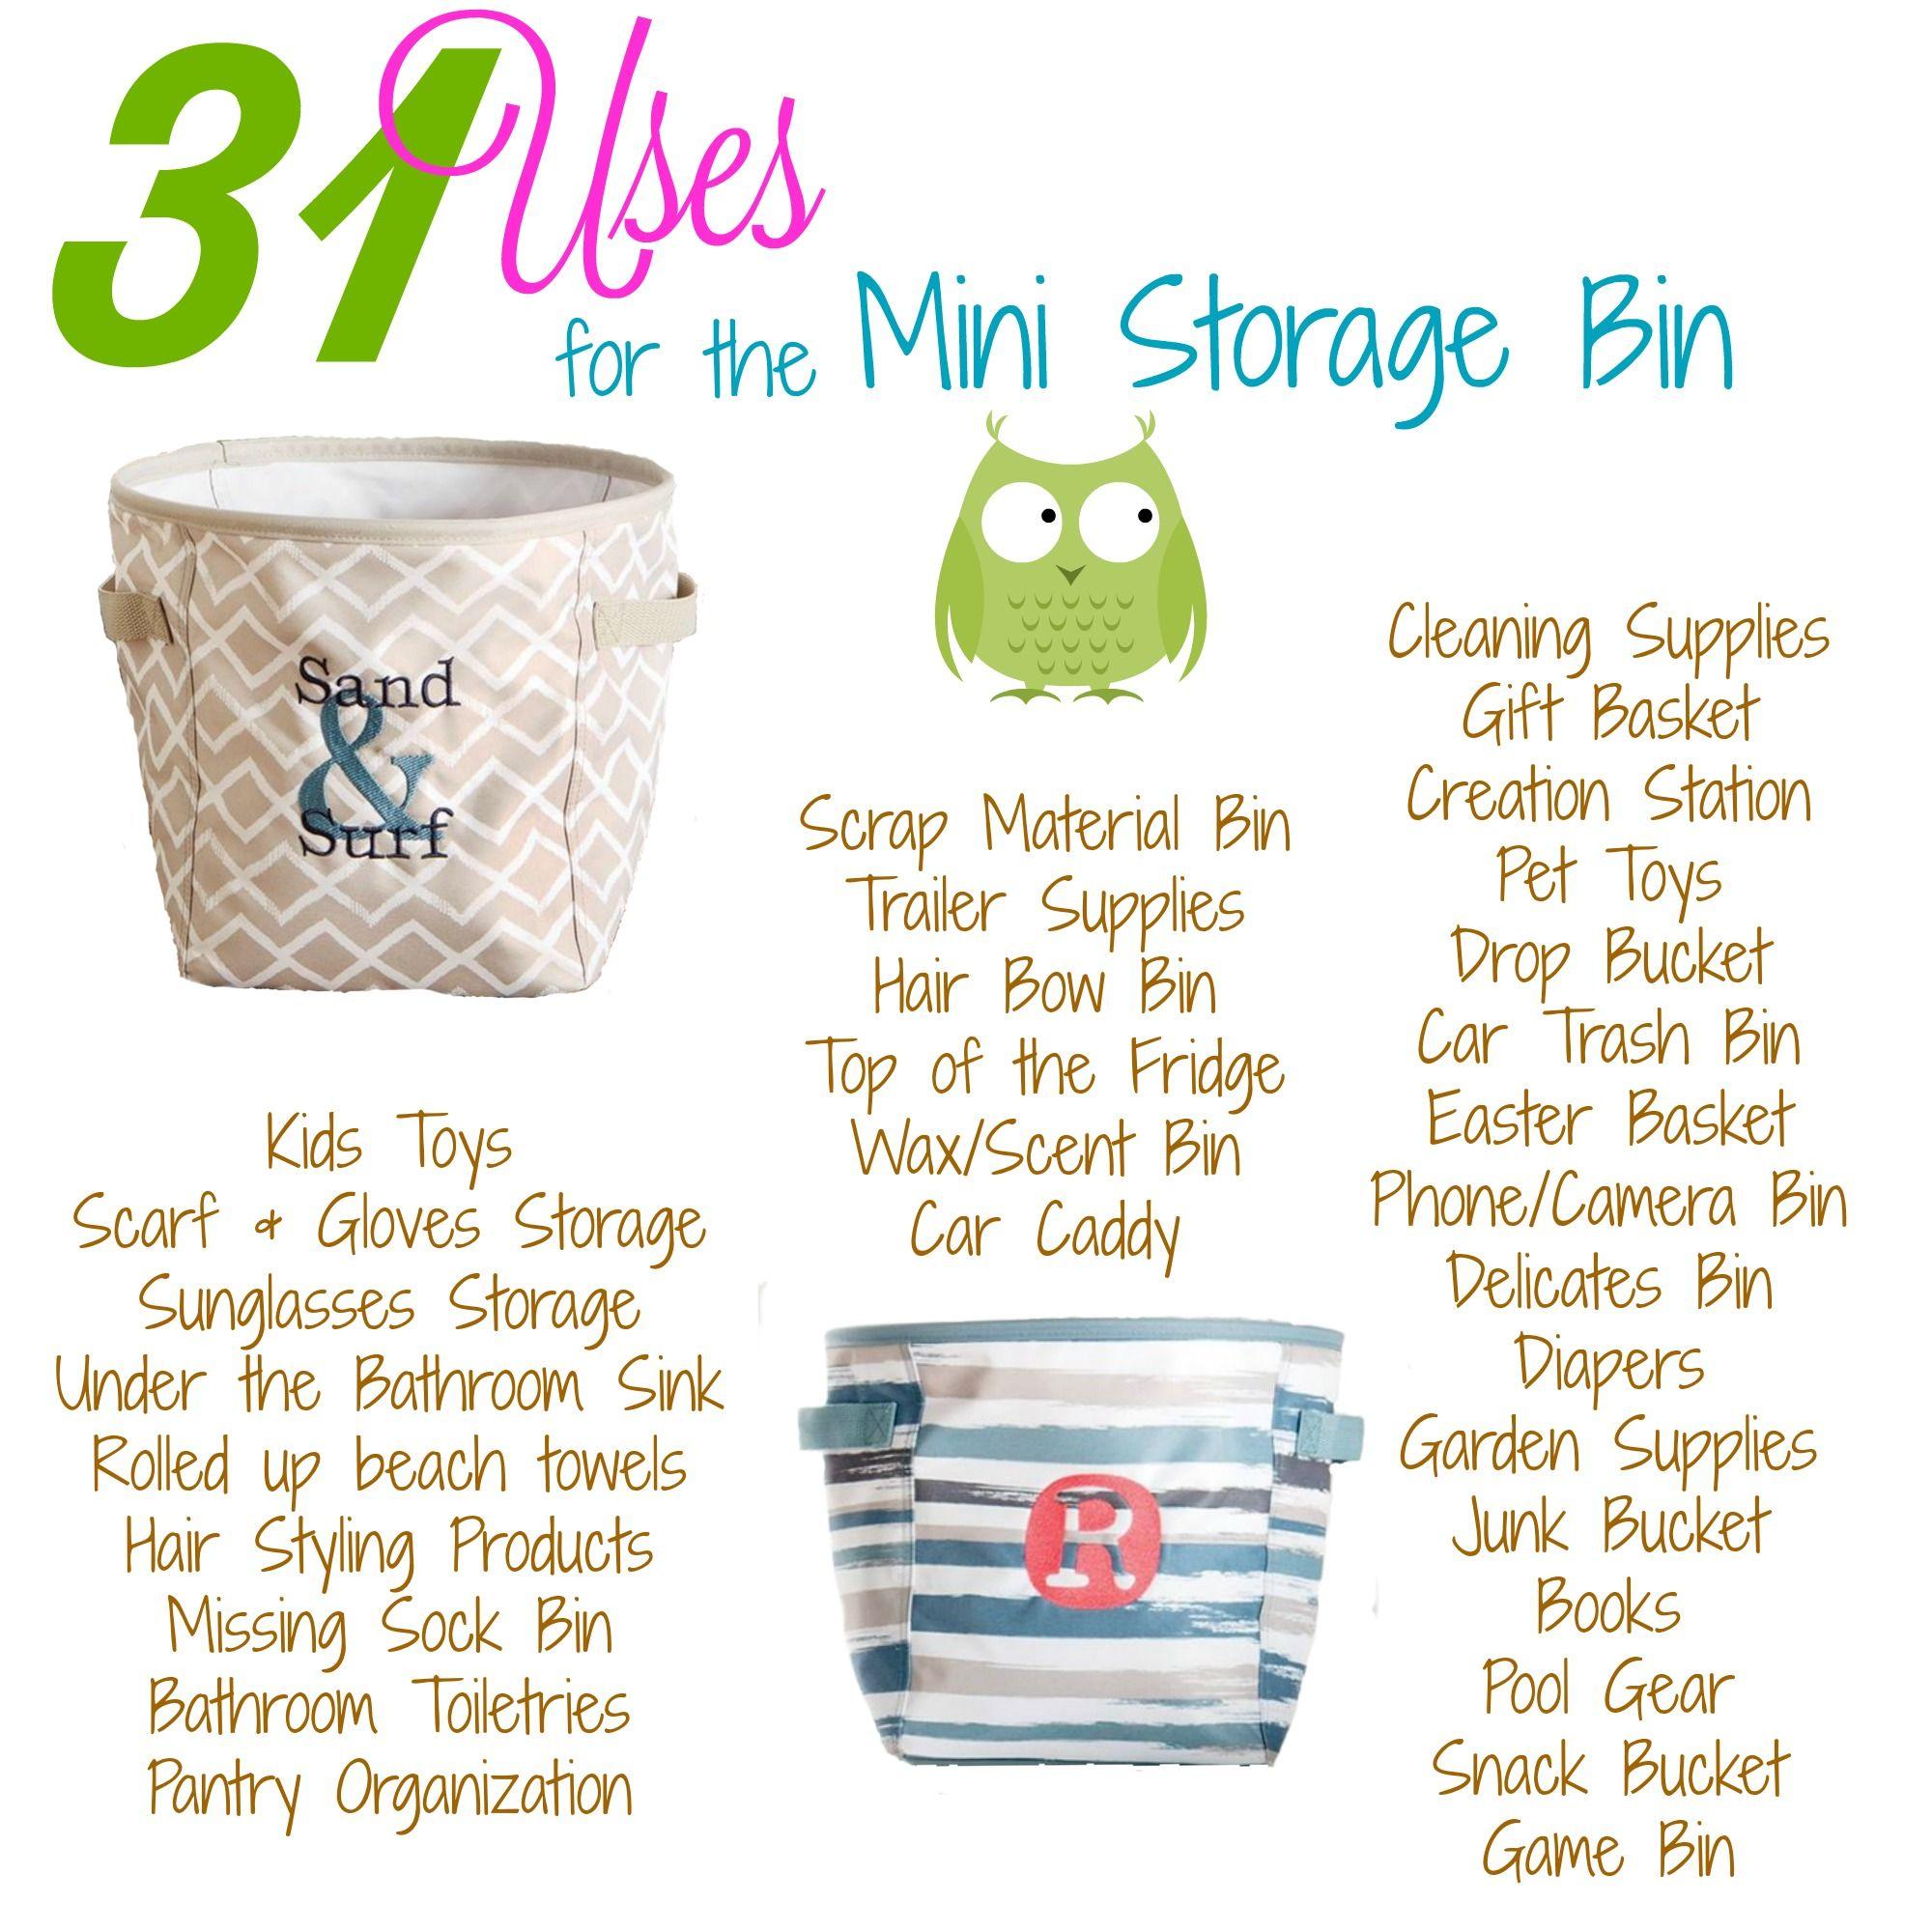 Genial Thirty Oneu0027s Uses For Our Mini Storage Bin :)